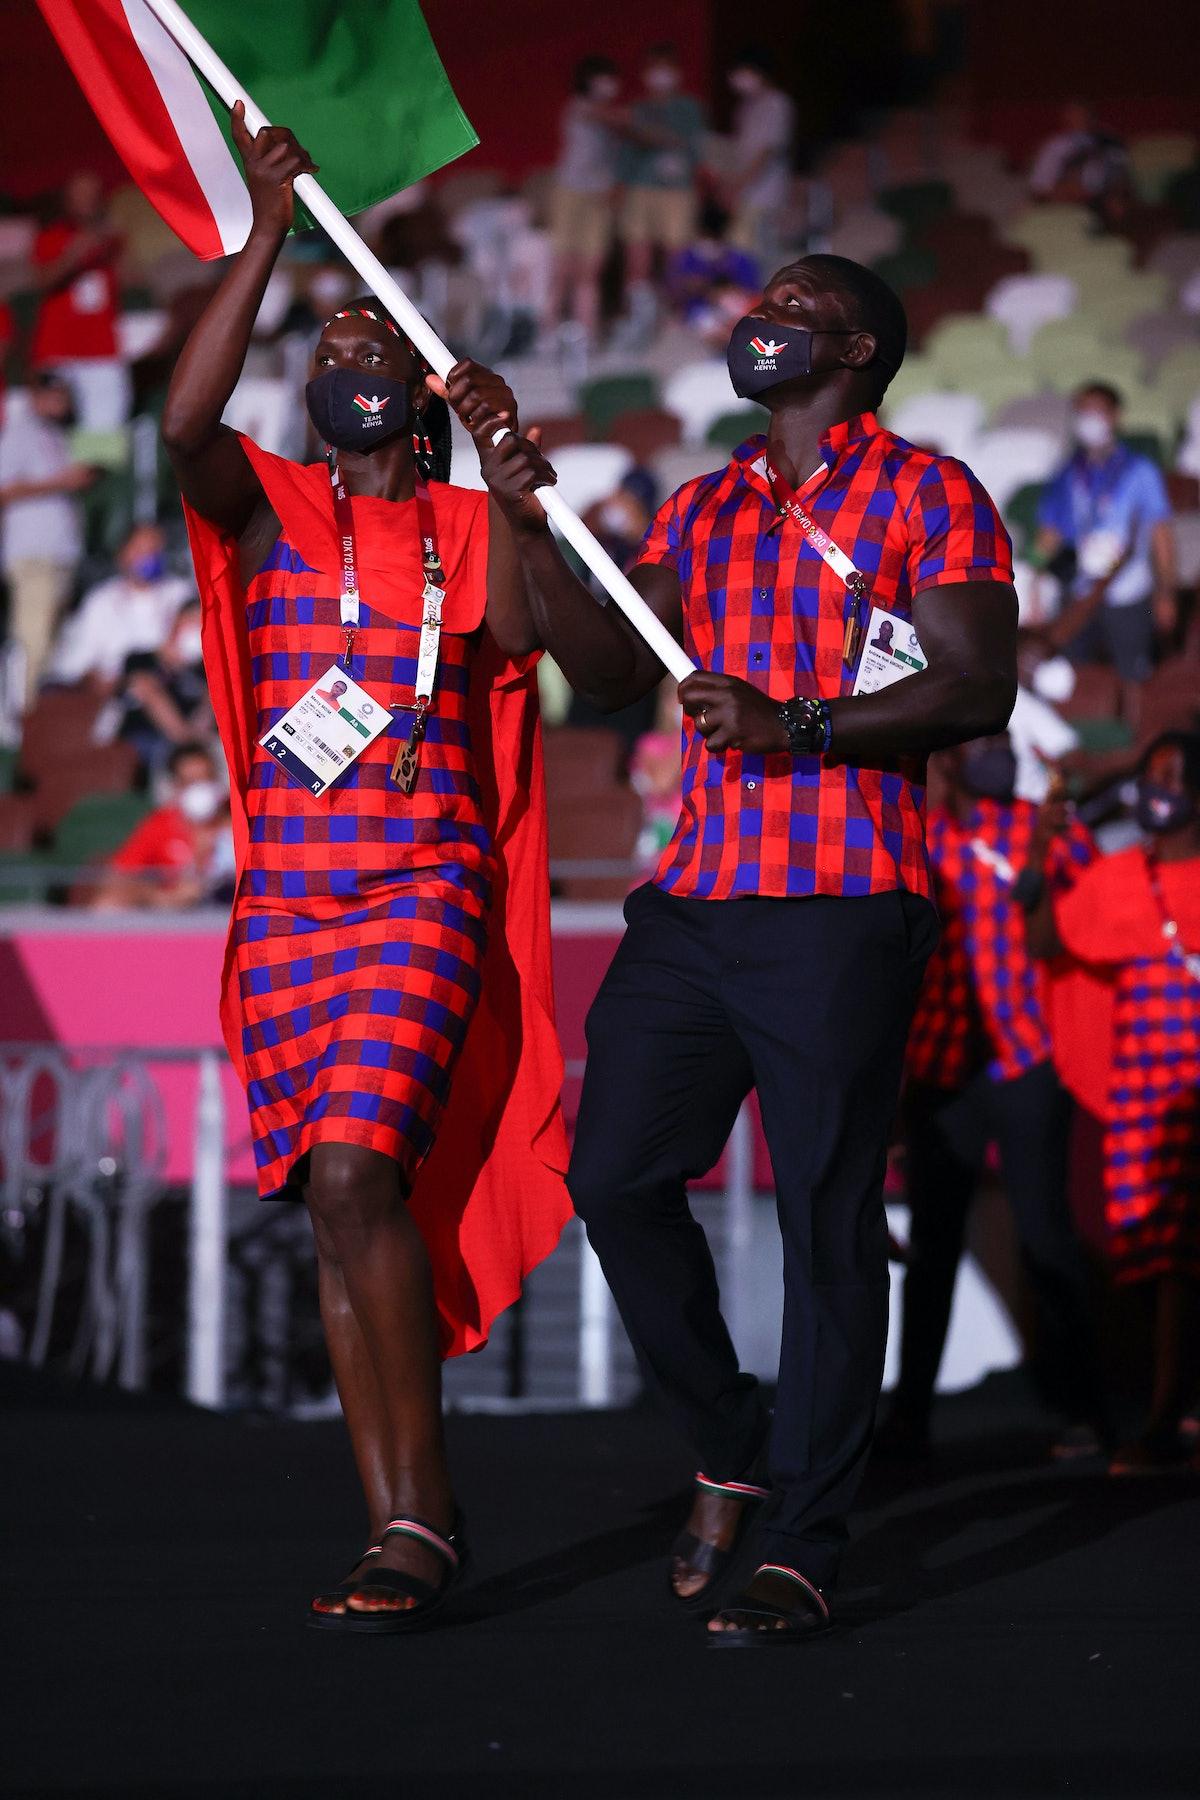 TOKYO, JAPAN - JULY 23: Flag bearers Mercy Moim and Andrew Amonde of Team Kenya lead their team duri...